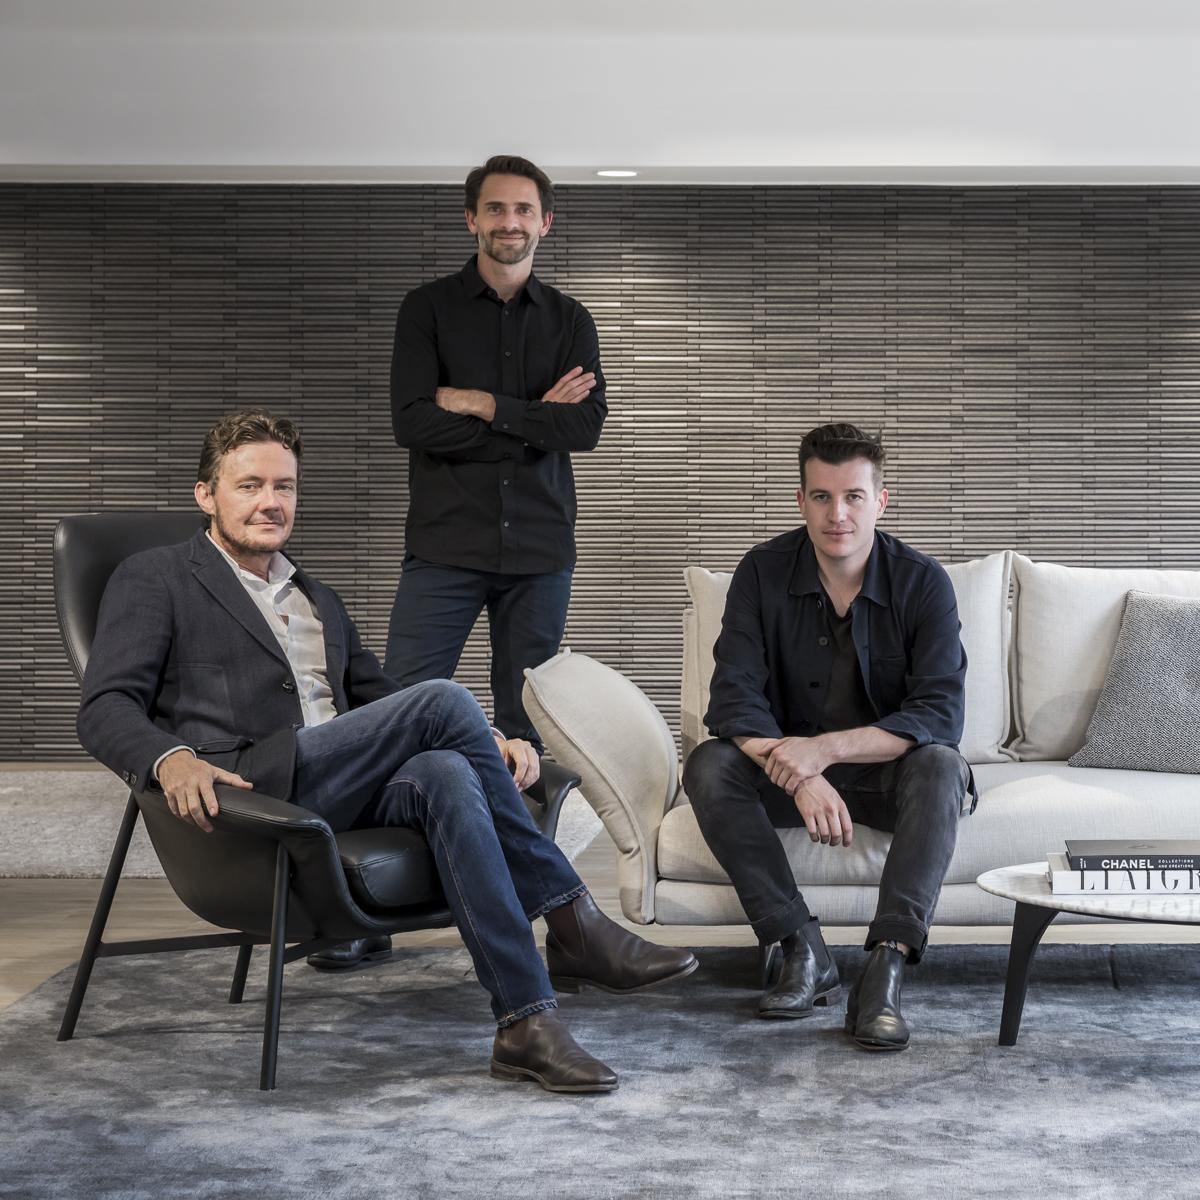 King Living Charles Wilson, David Hardwick & Tom Fereday Denfair Feature Supporting Local Design & Manufacturingpv Tlpxkl Low 2